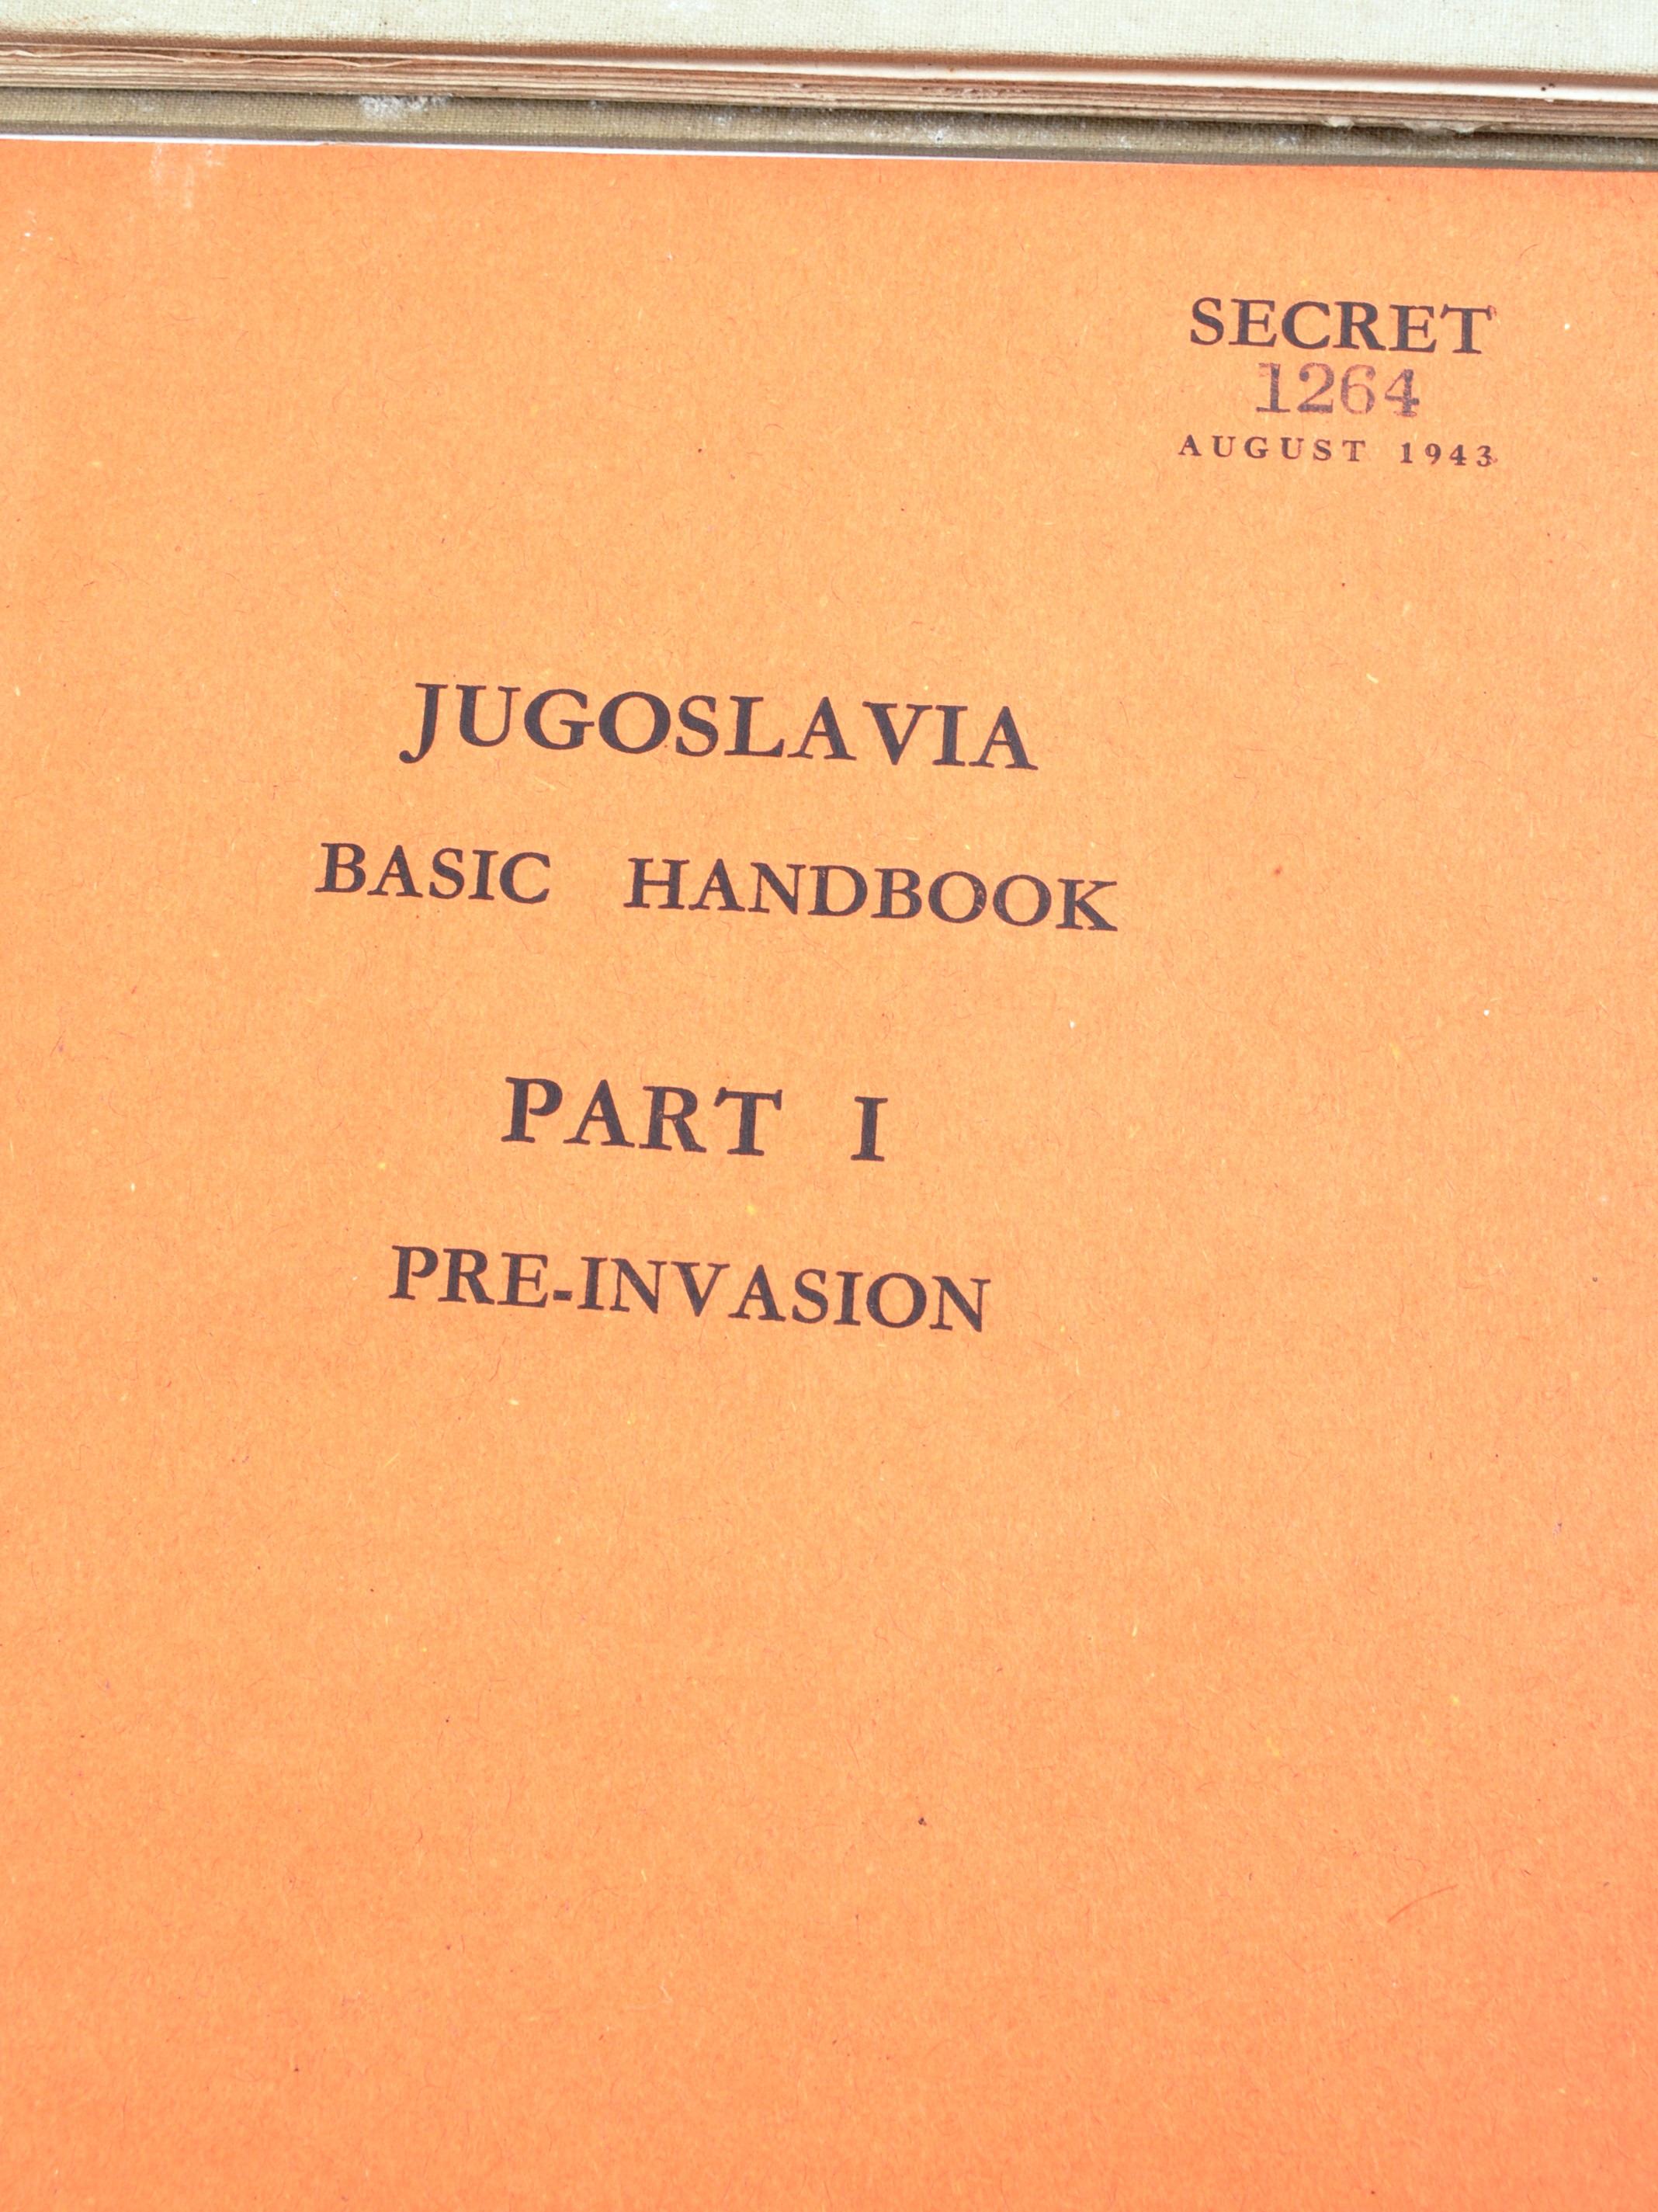 RARE ORIGINAL WWII 'SECRET' JUGOSLAVIA BRITISH HANDBOOKS - Image 2 of 9